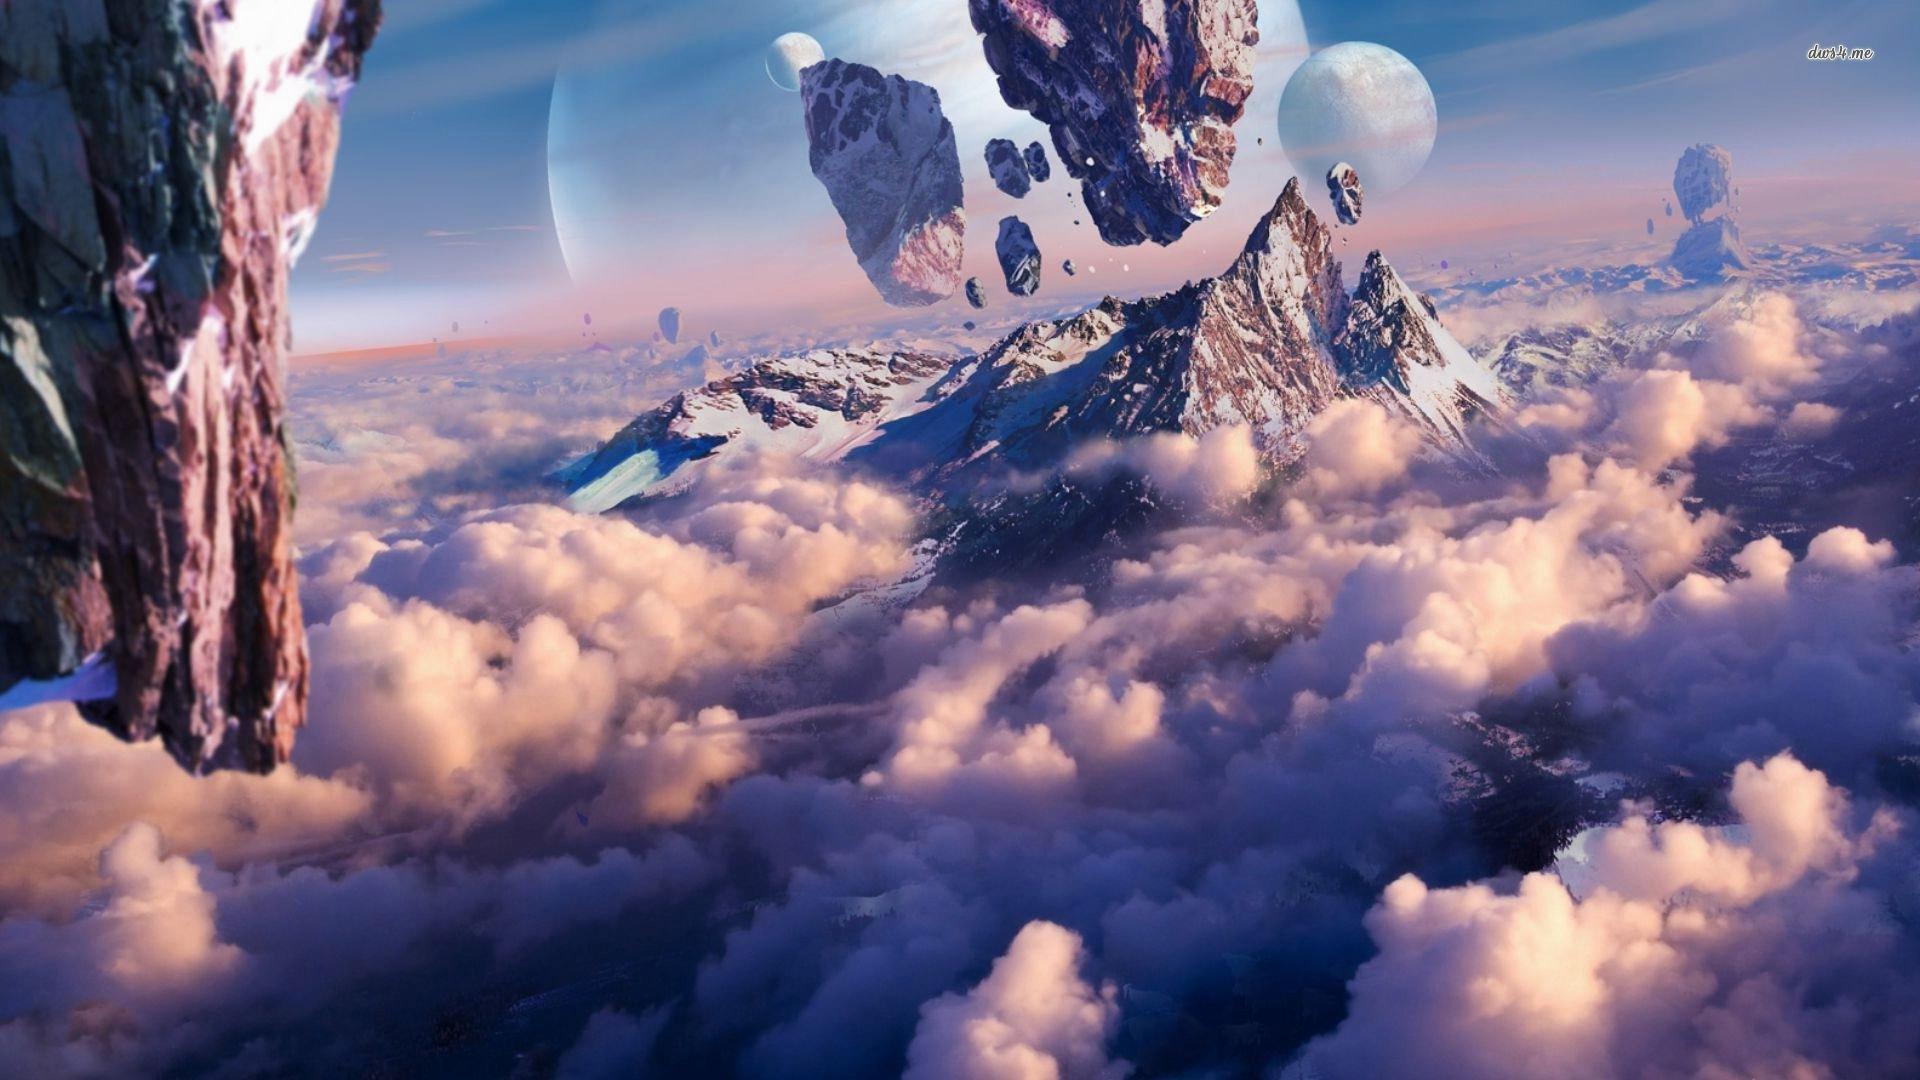 clouds-mountains-Google-wallpaper-wpt7603098